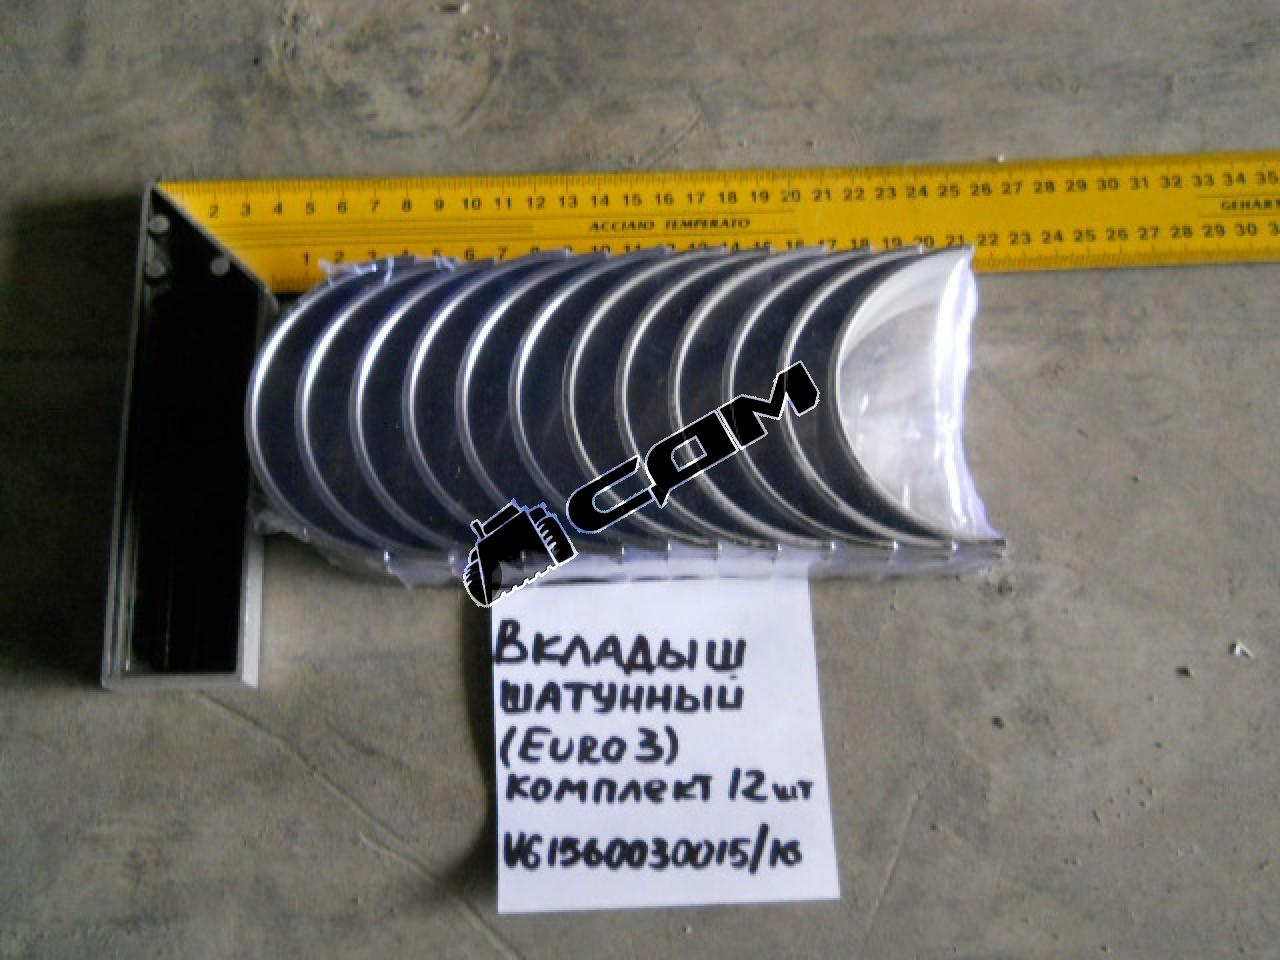 Вкладыш шатунный (Euro 3), комплект 12 шт. HOWO  VG1560030015/16